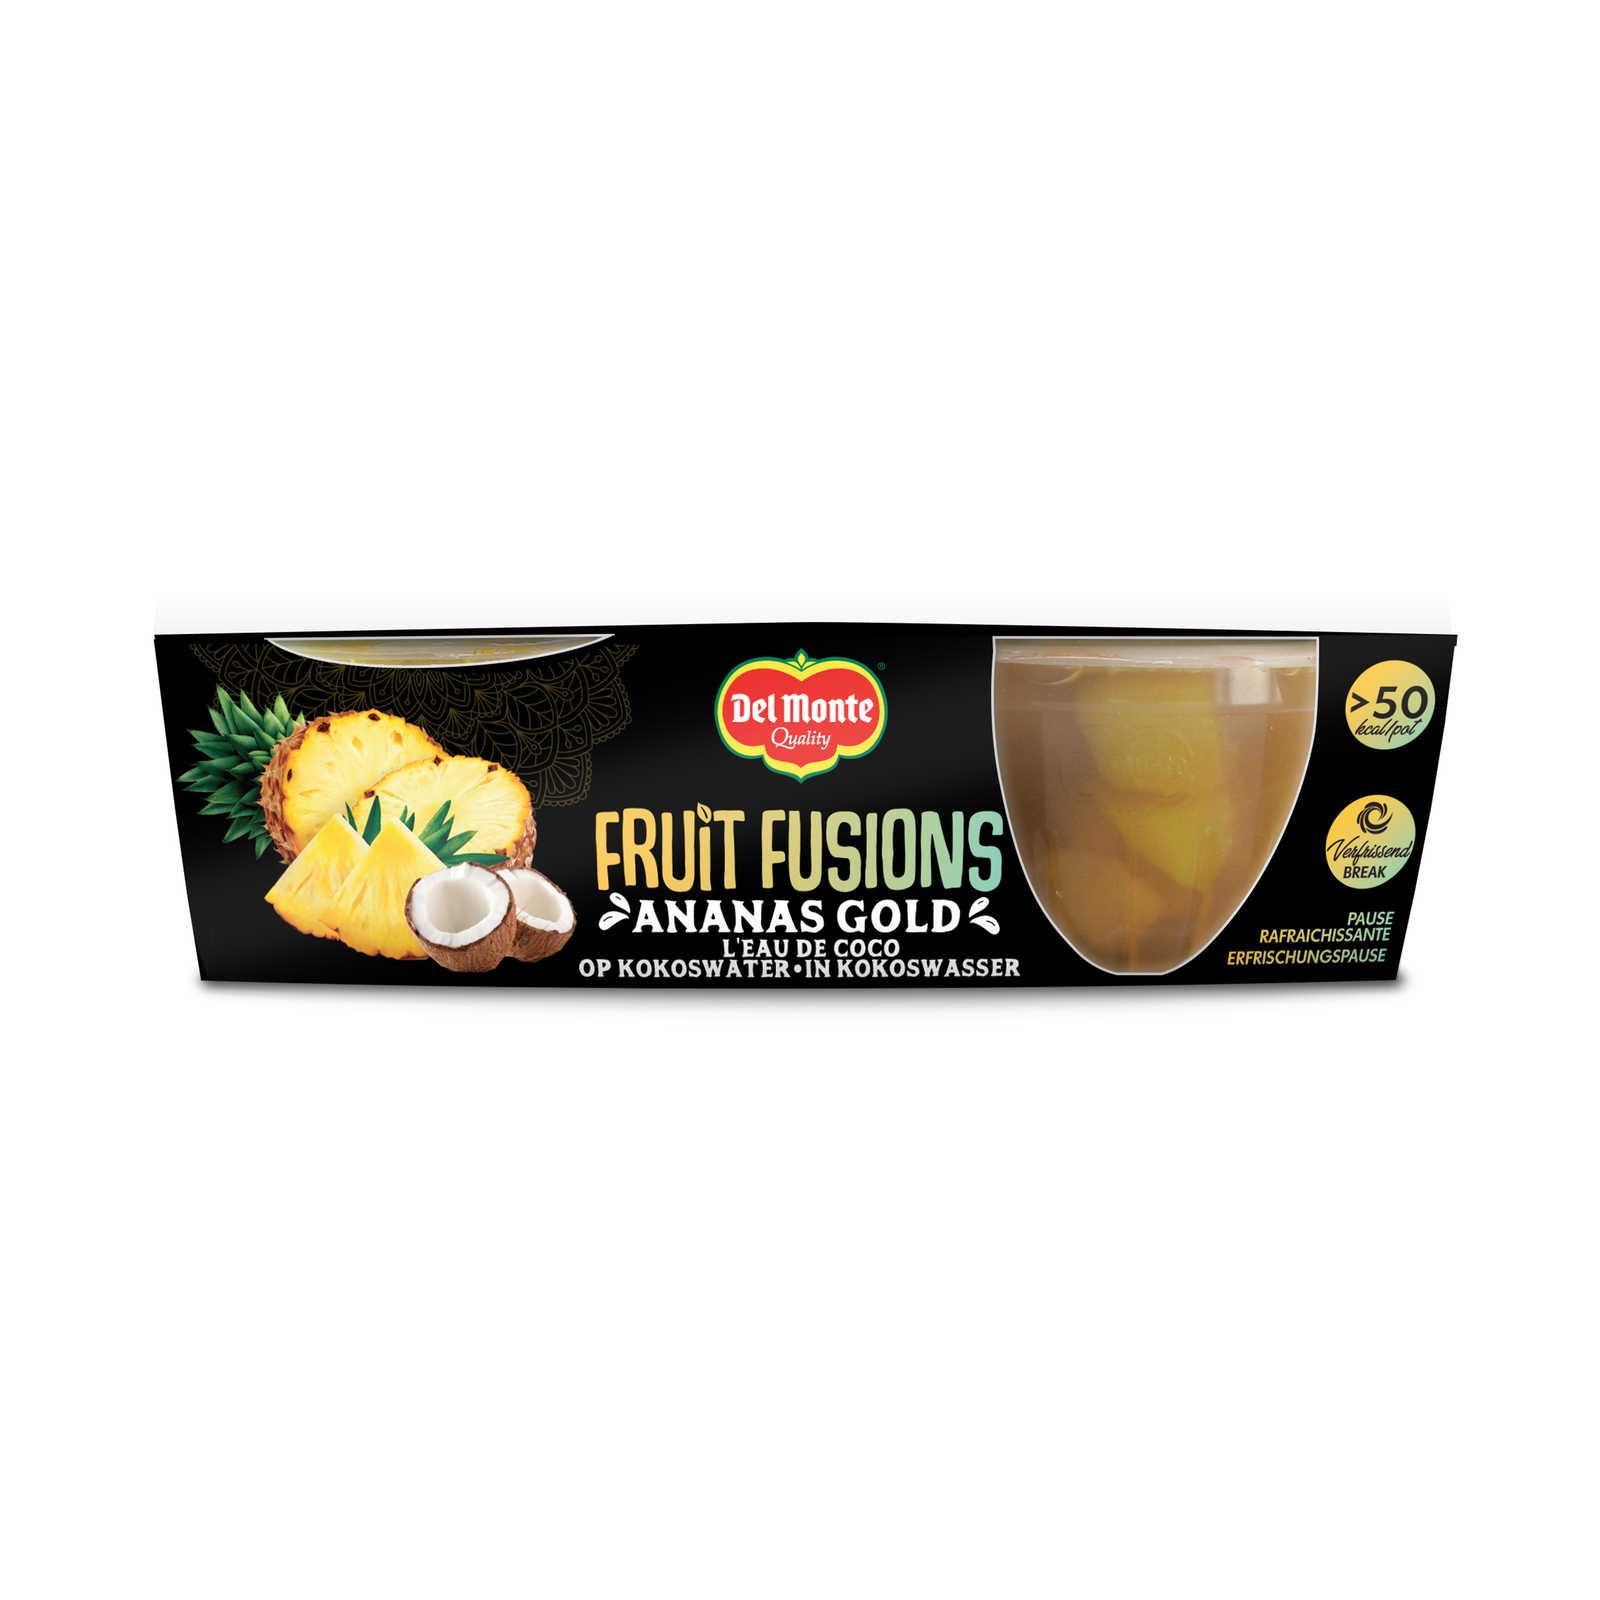 Del Monte-Fruit Fusions